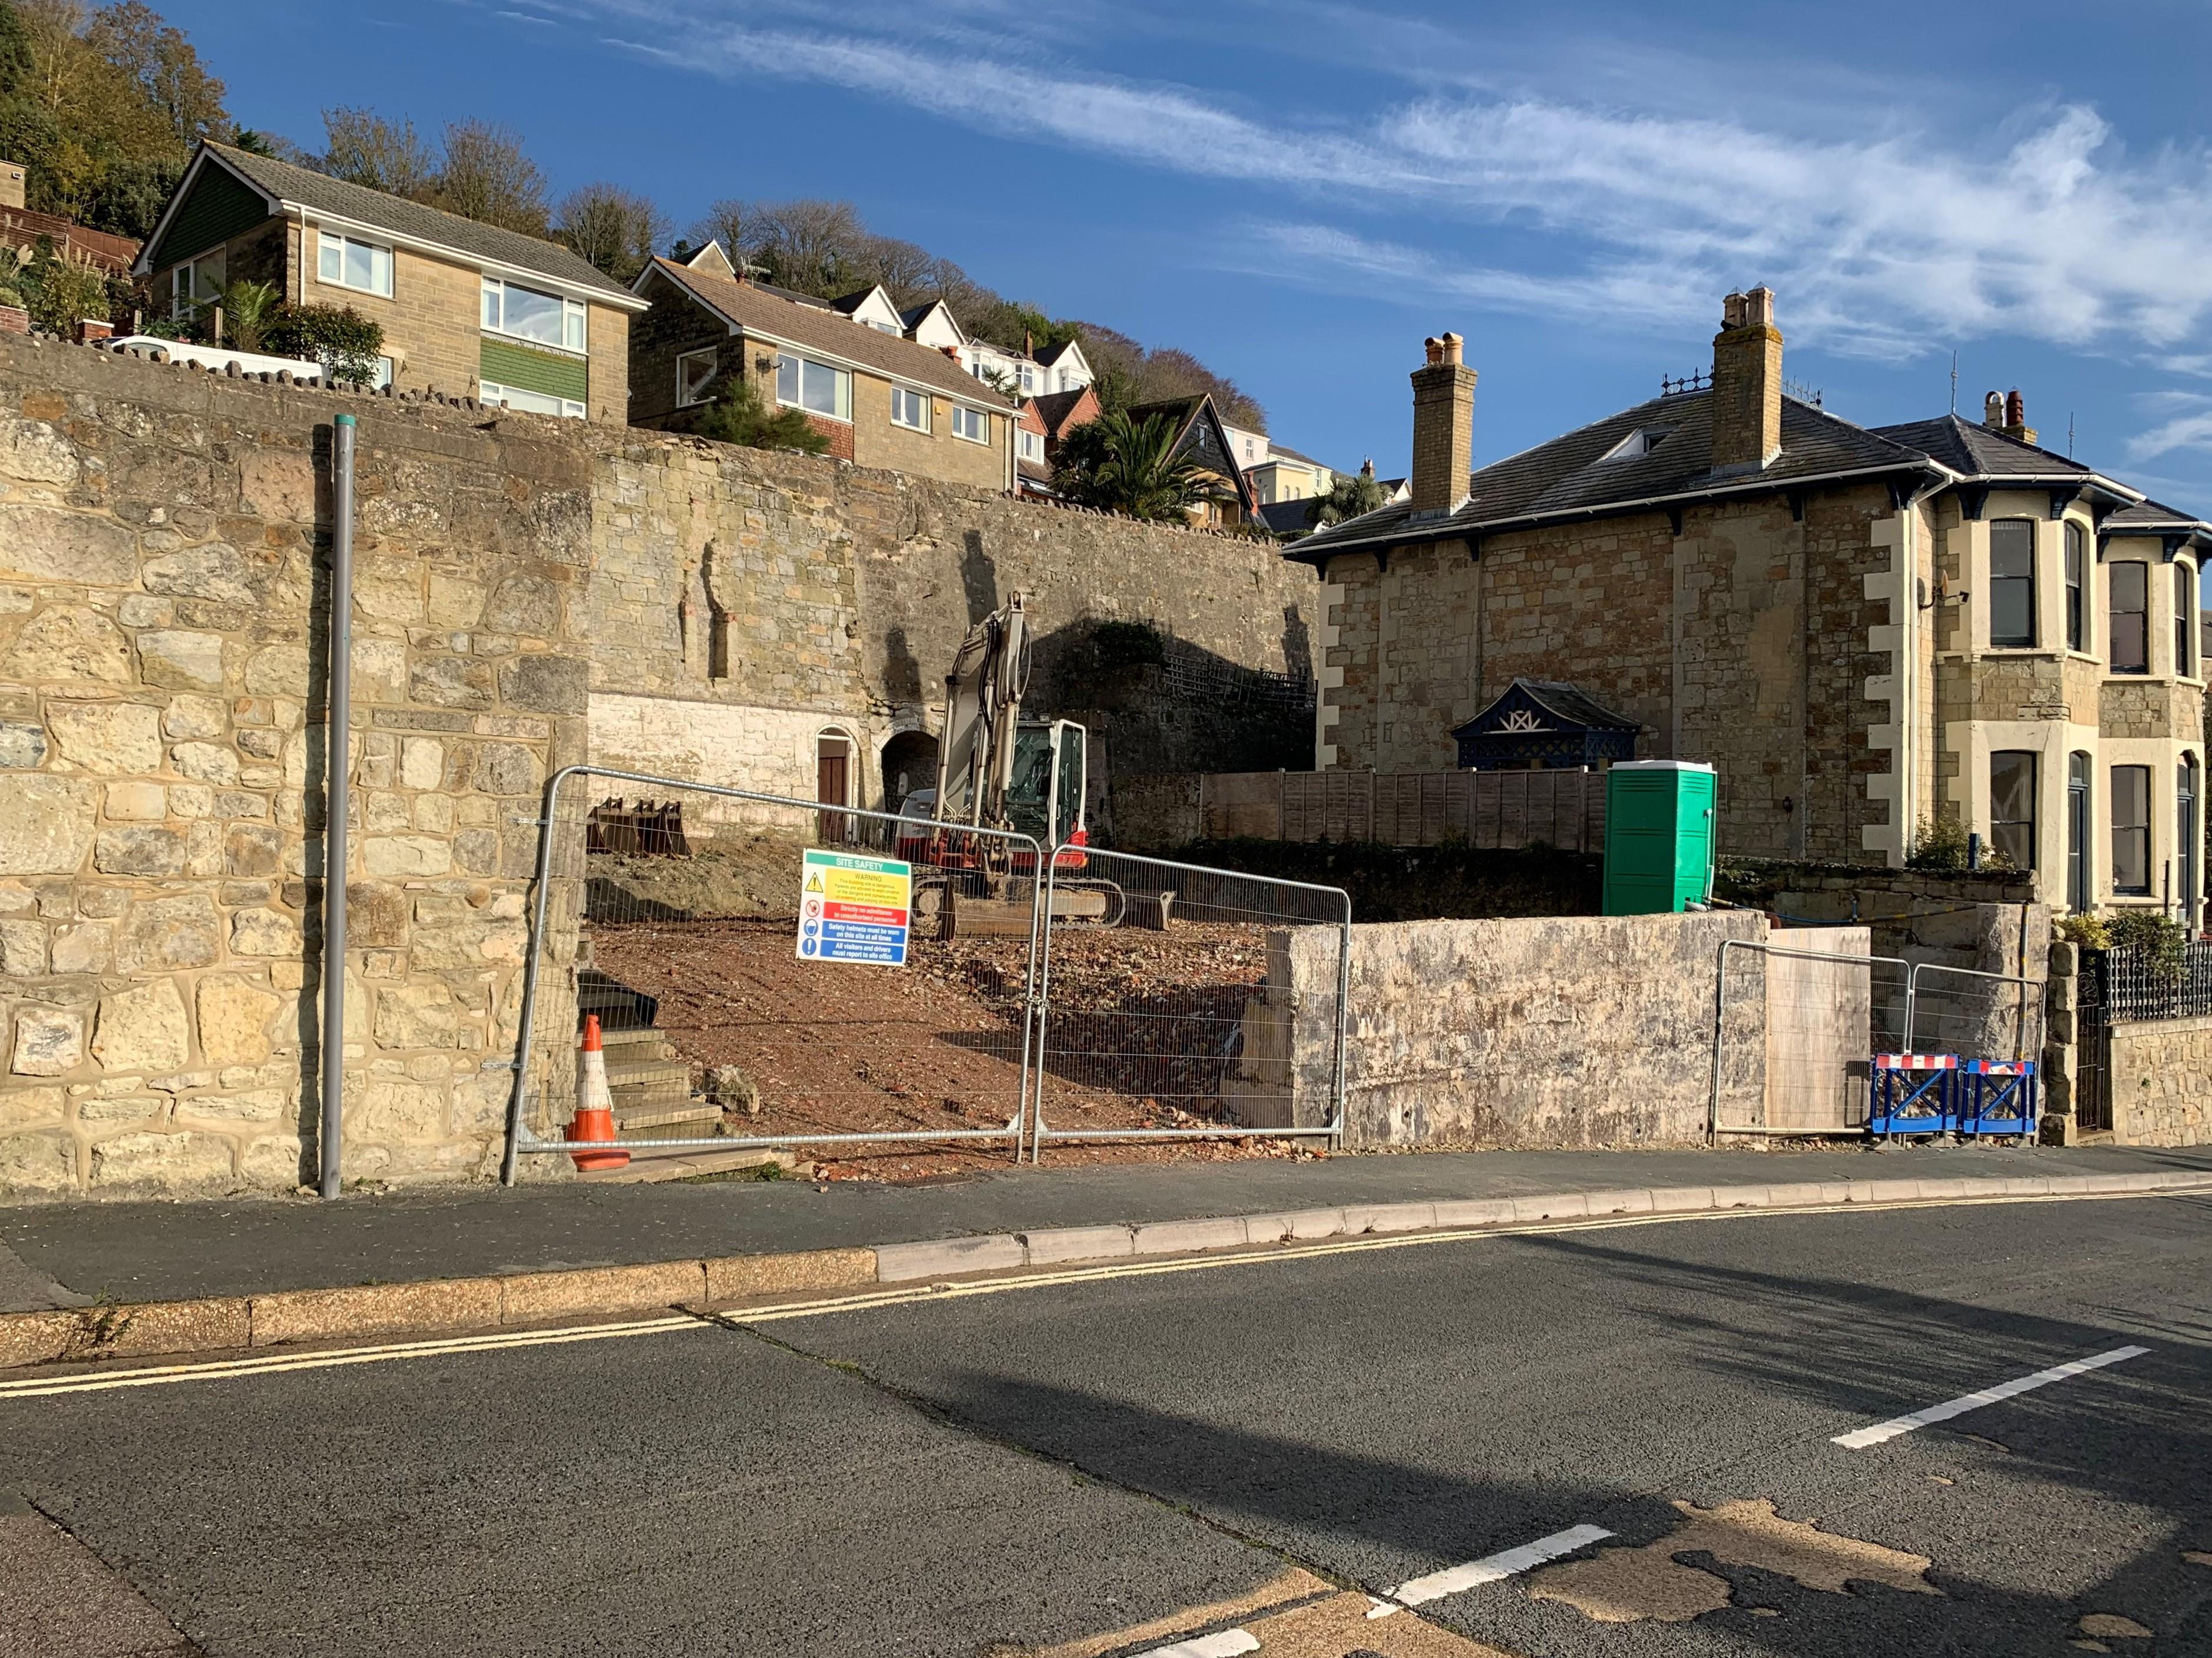 Ventnor, Isle of Wight - Building on a Landslide